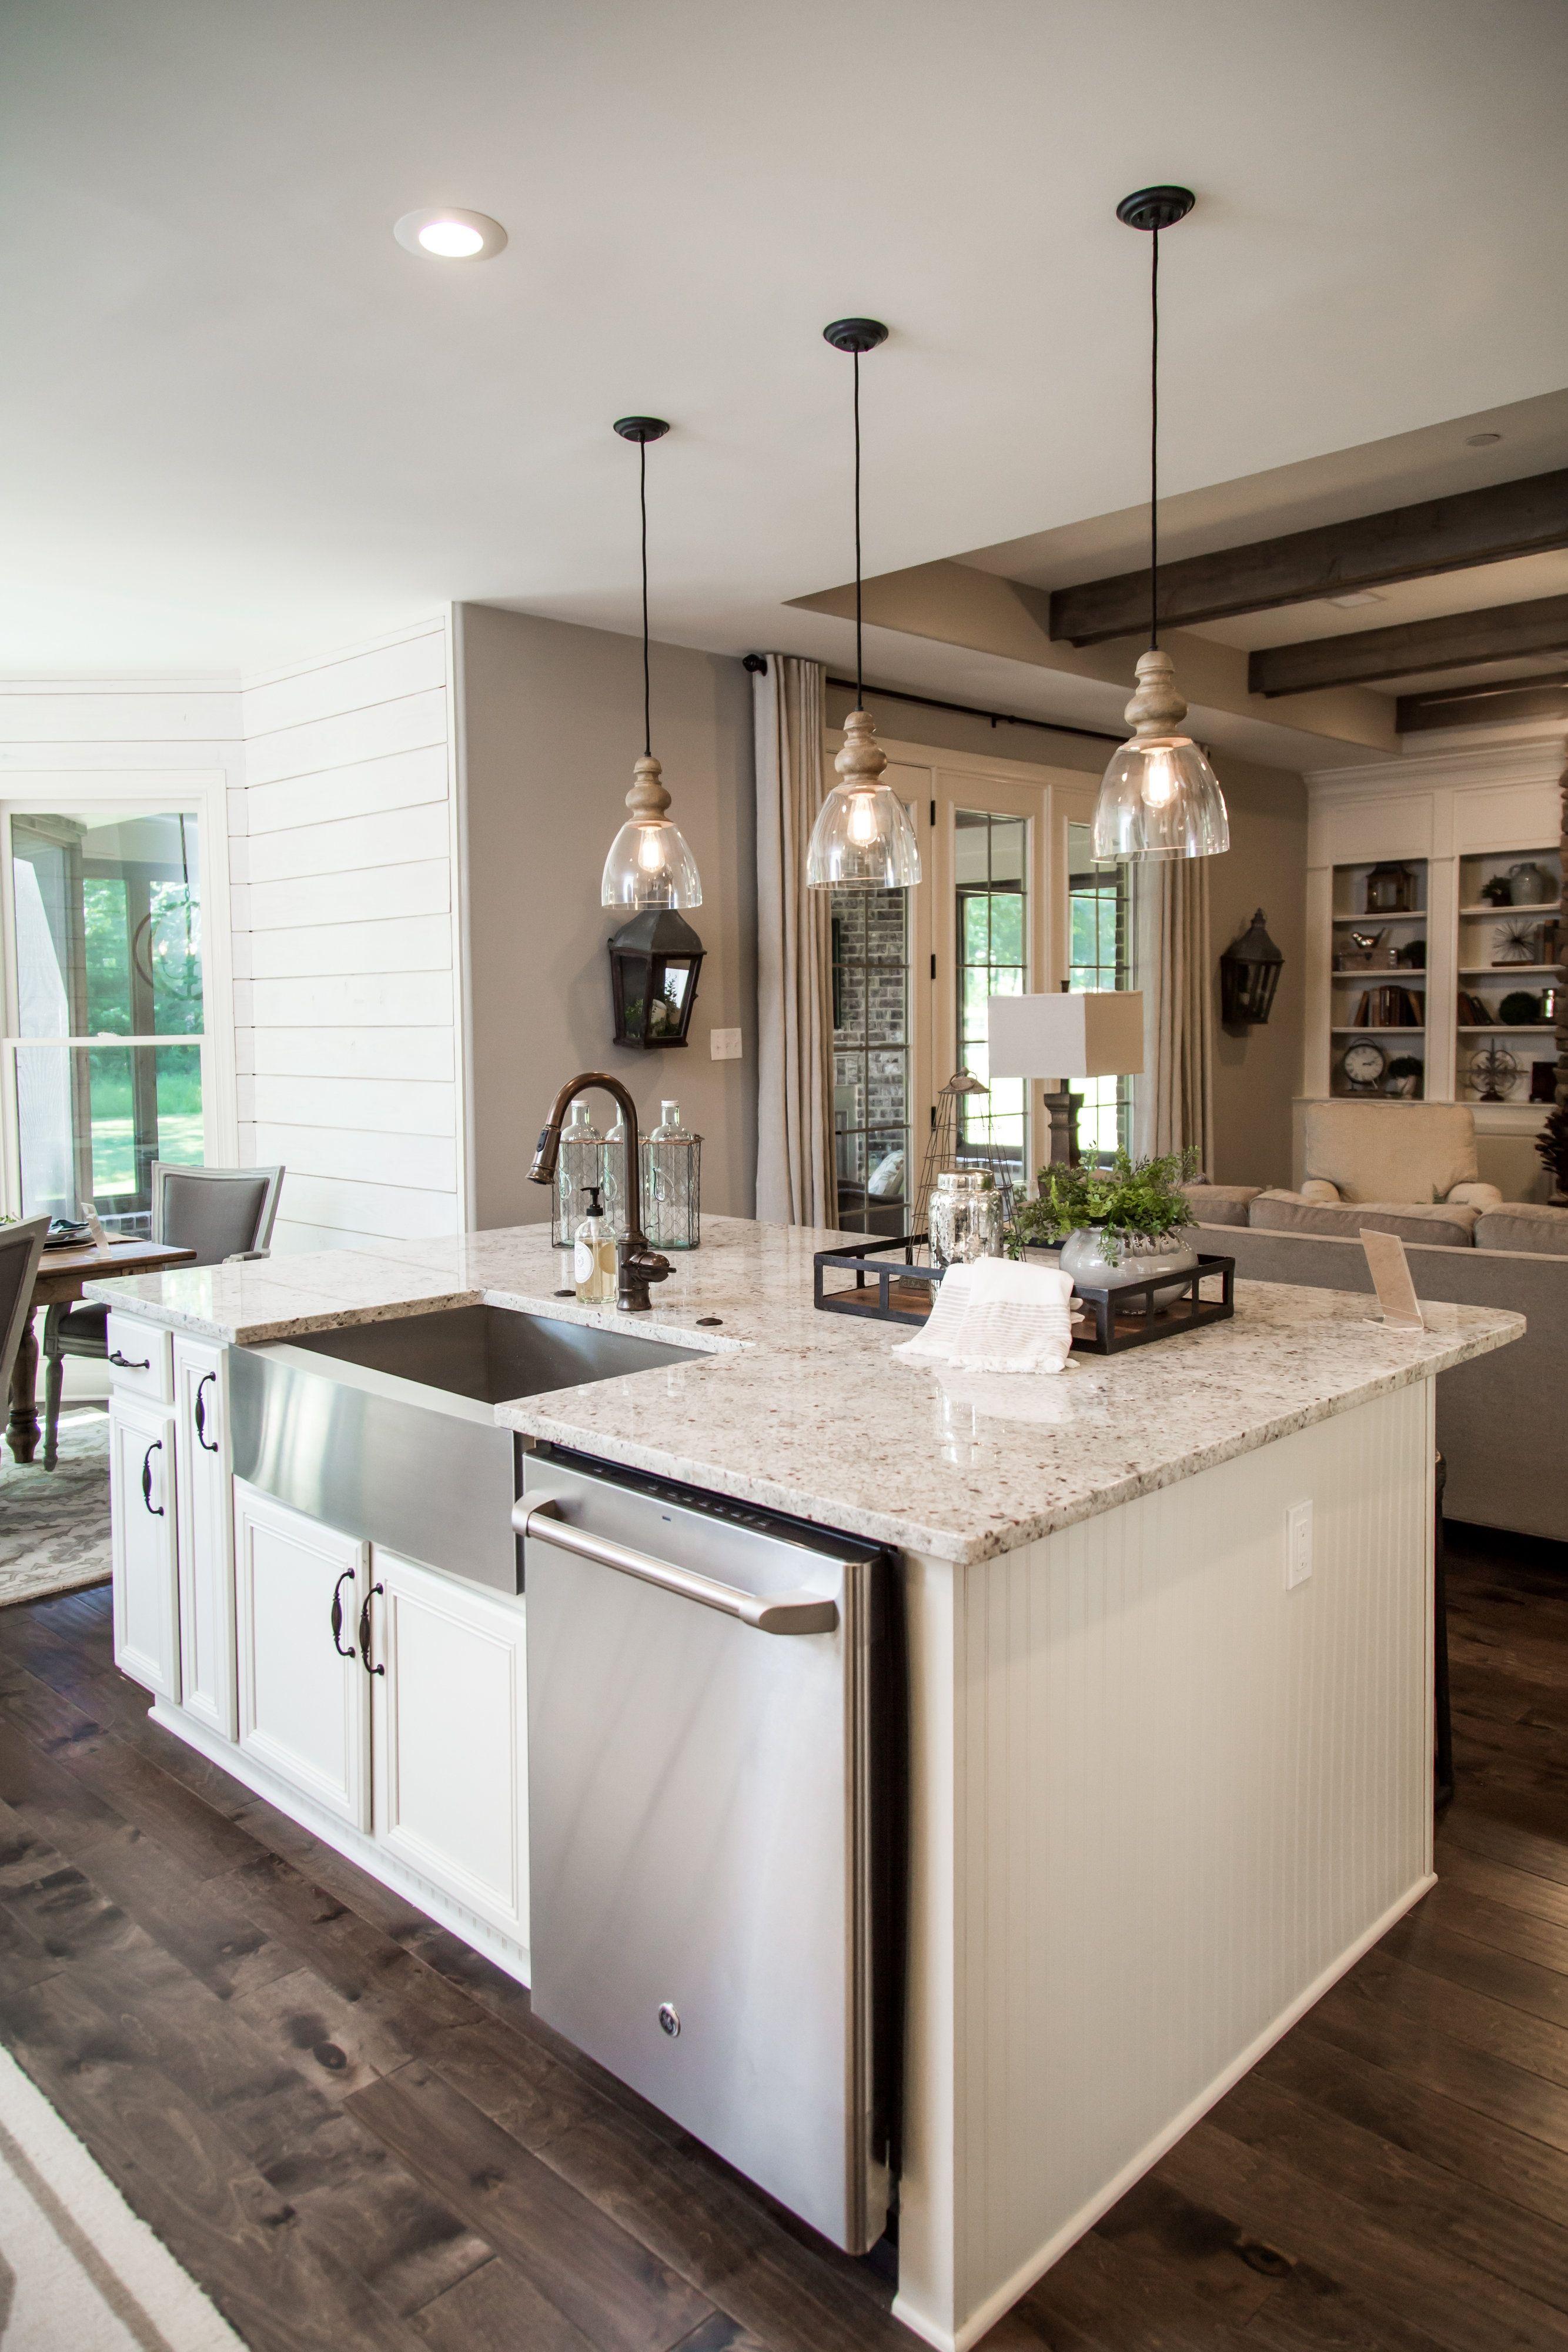 Shaw's Creek Designer Model  Winstead Plan  Photo Gallery Interesting New Model Kitchen Design Design Inspiration